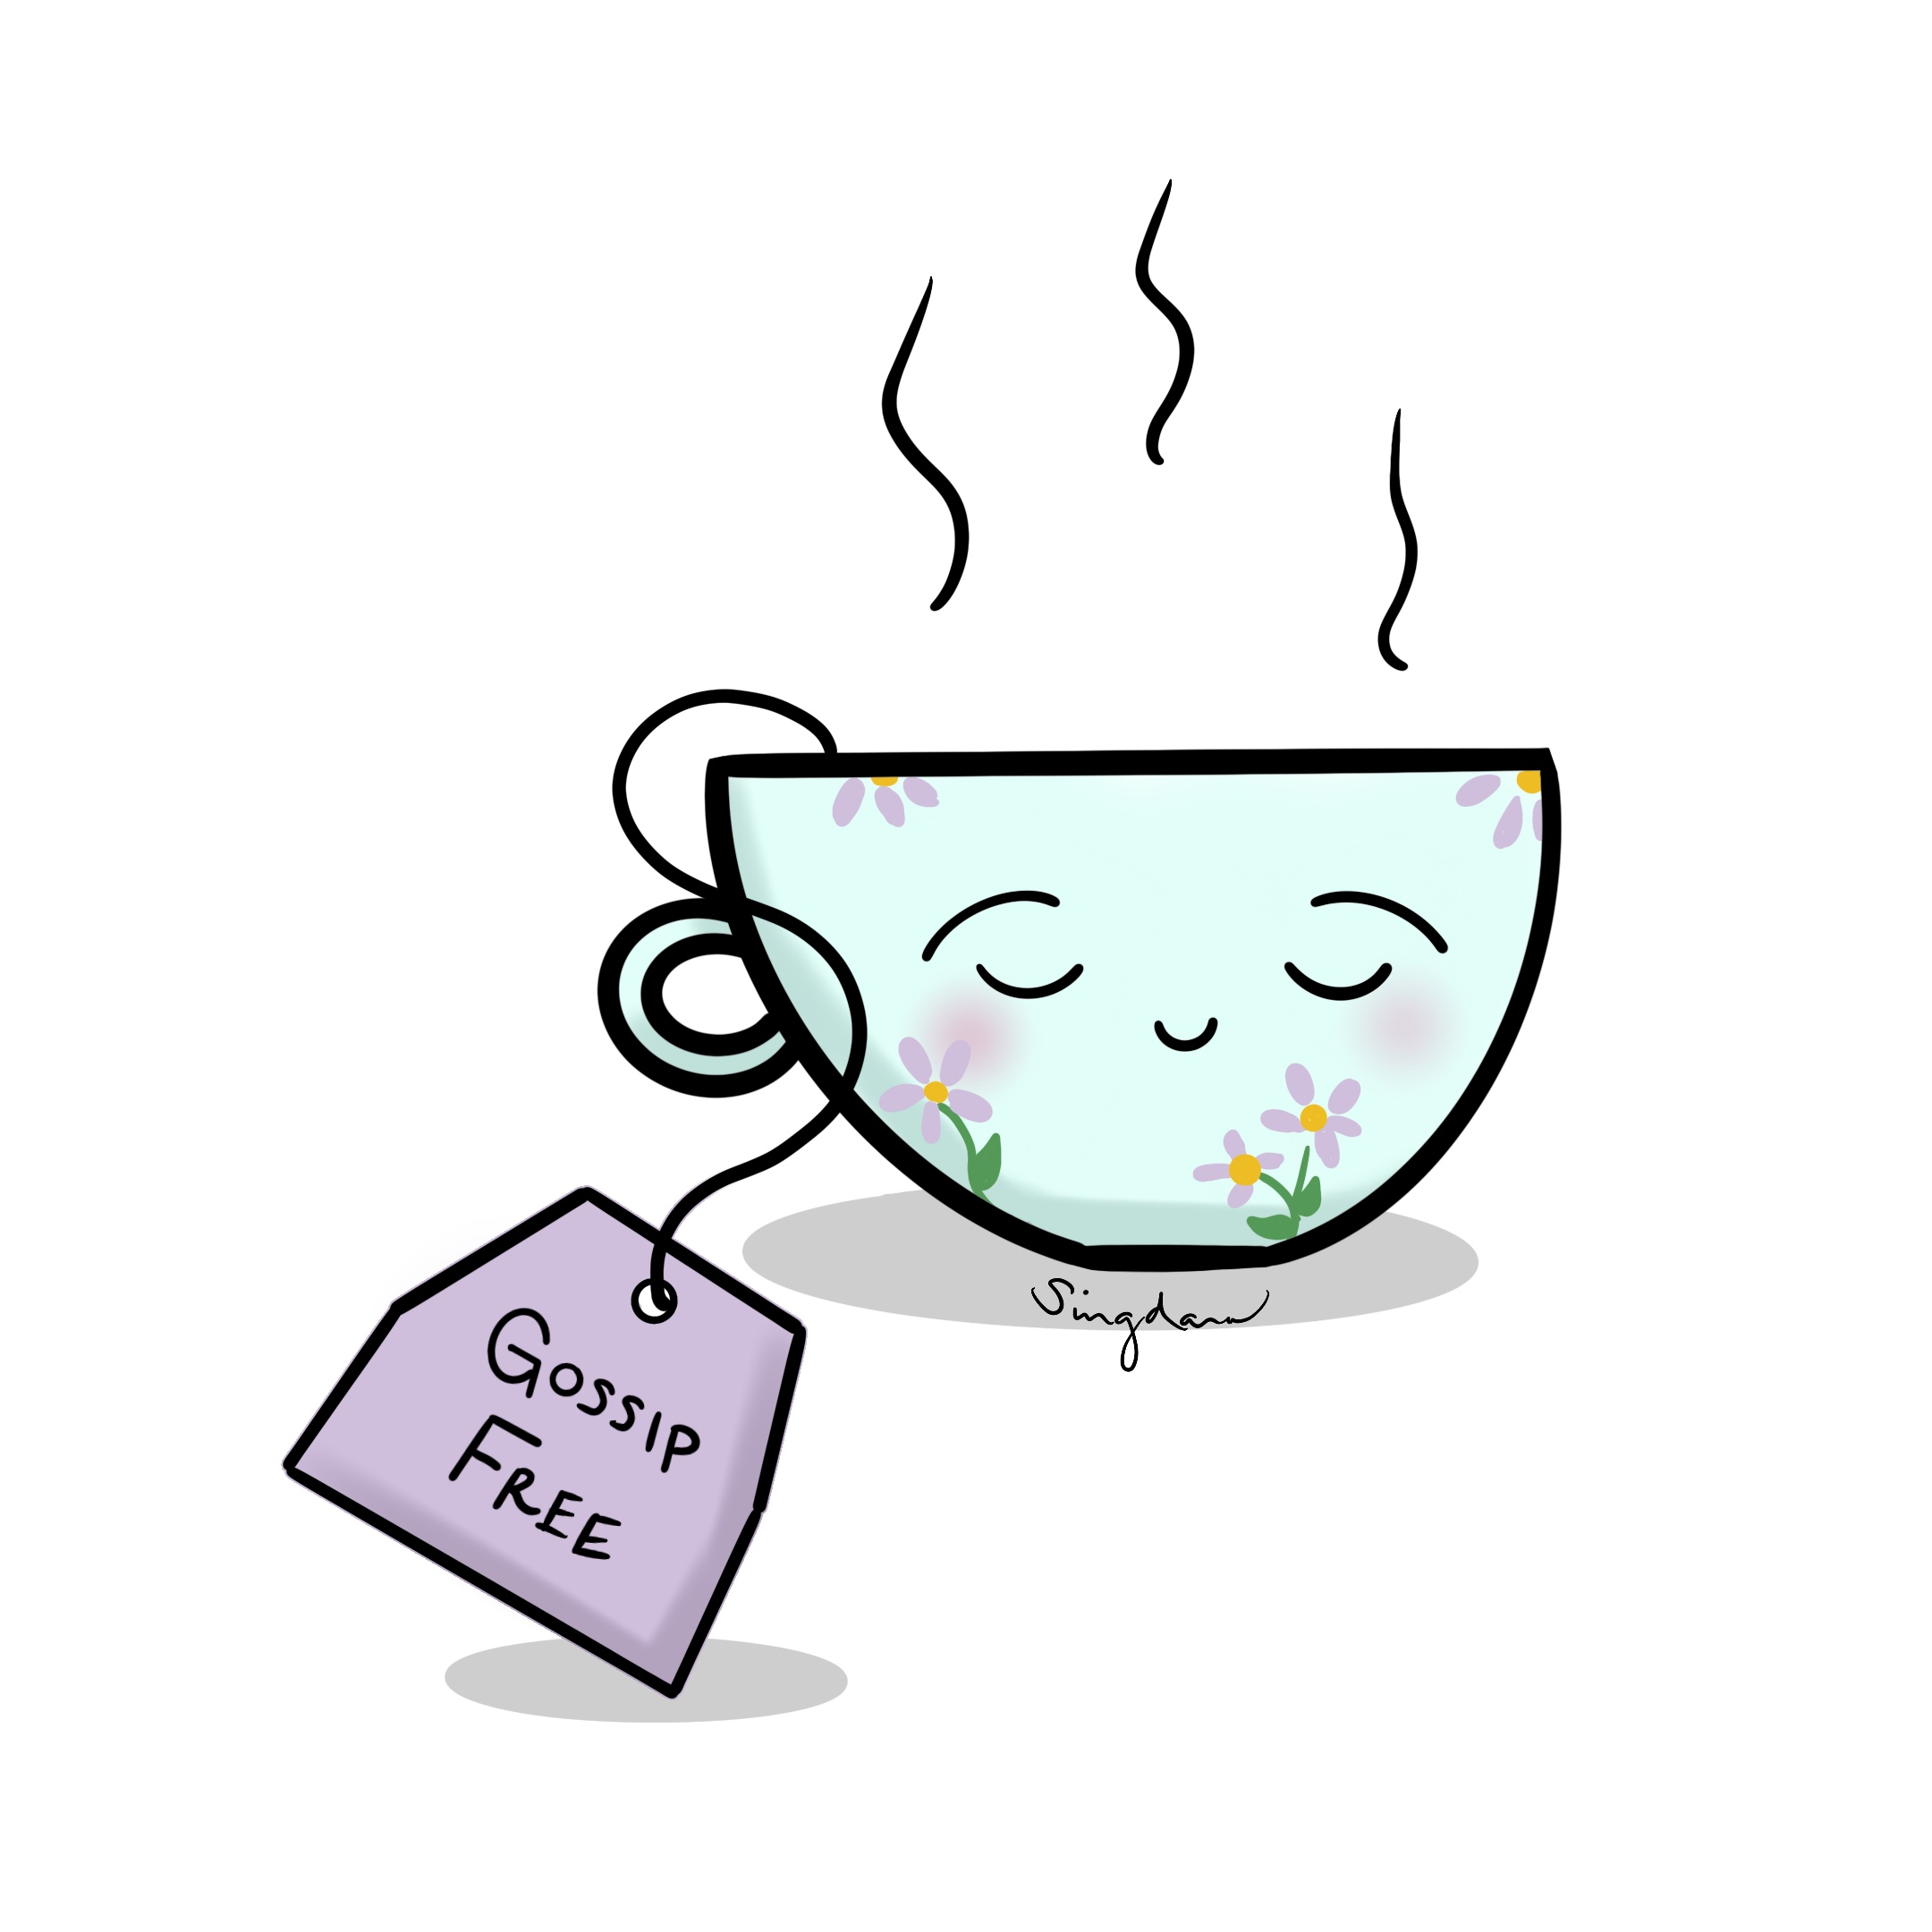 Gossip_Free_Tea.jpg